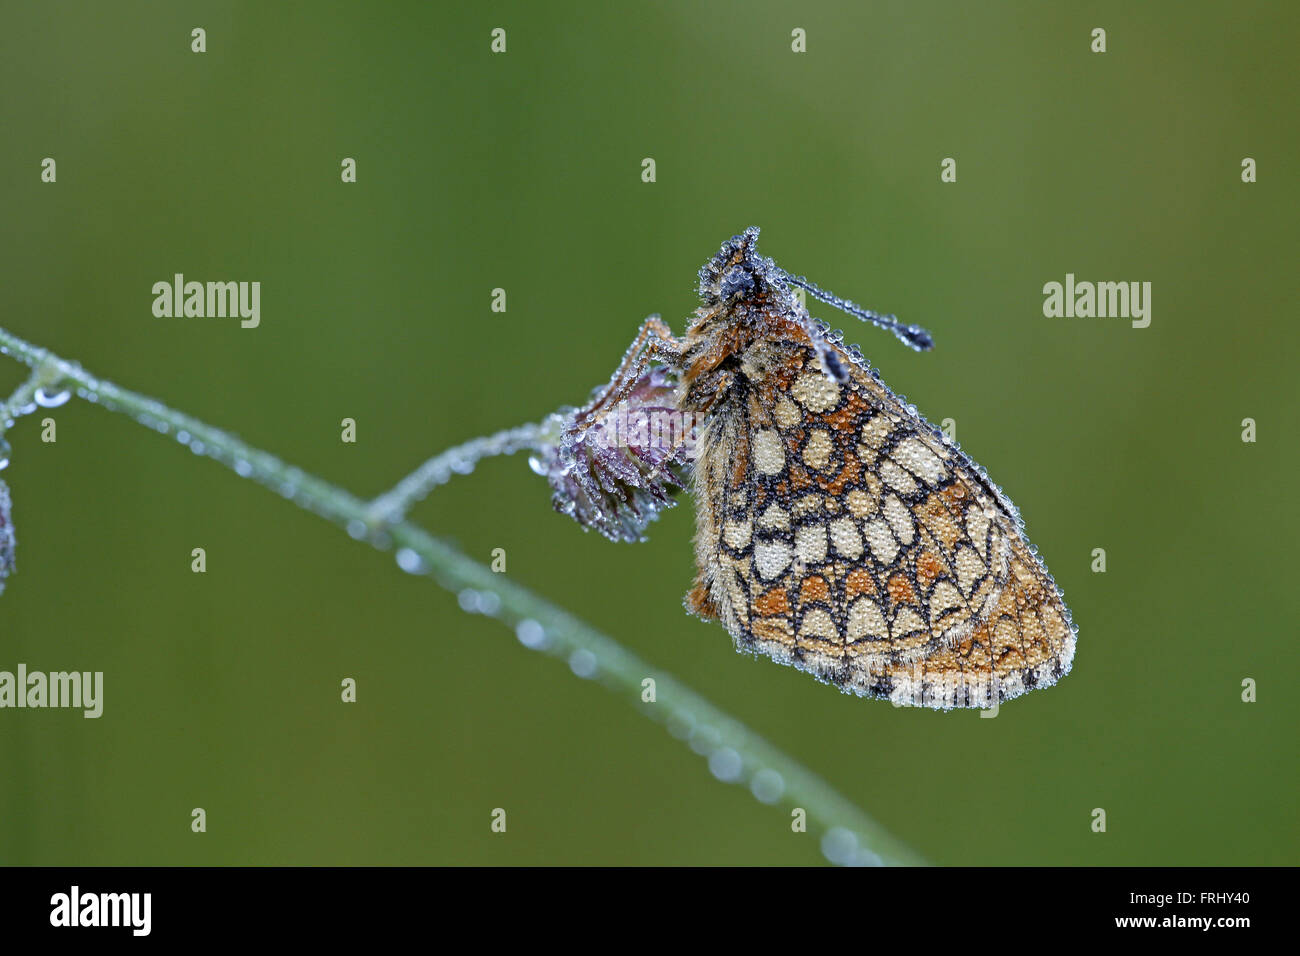 Heath Fritillary, Melitaea athalia, at dawn, covered in dewdrops - Stock Image